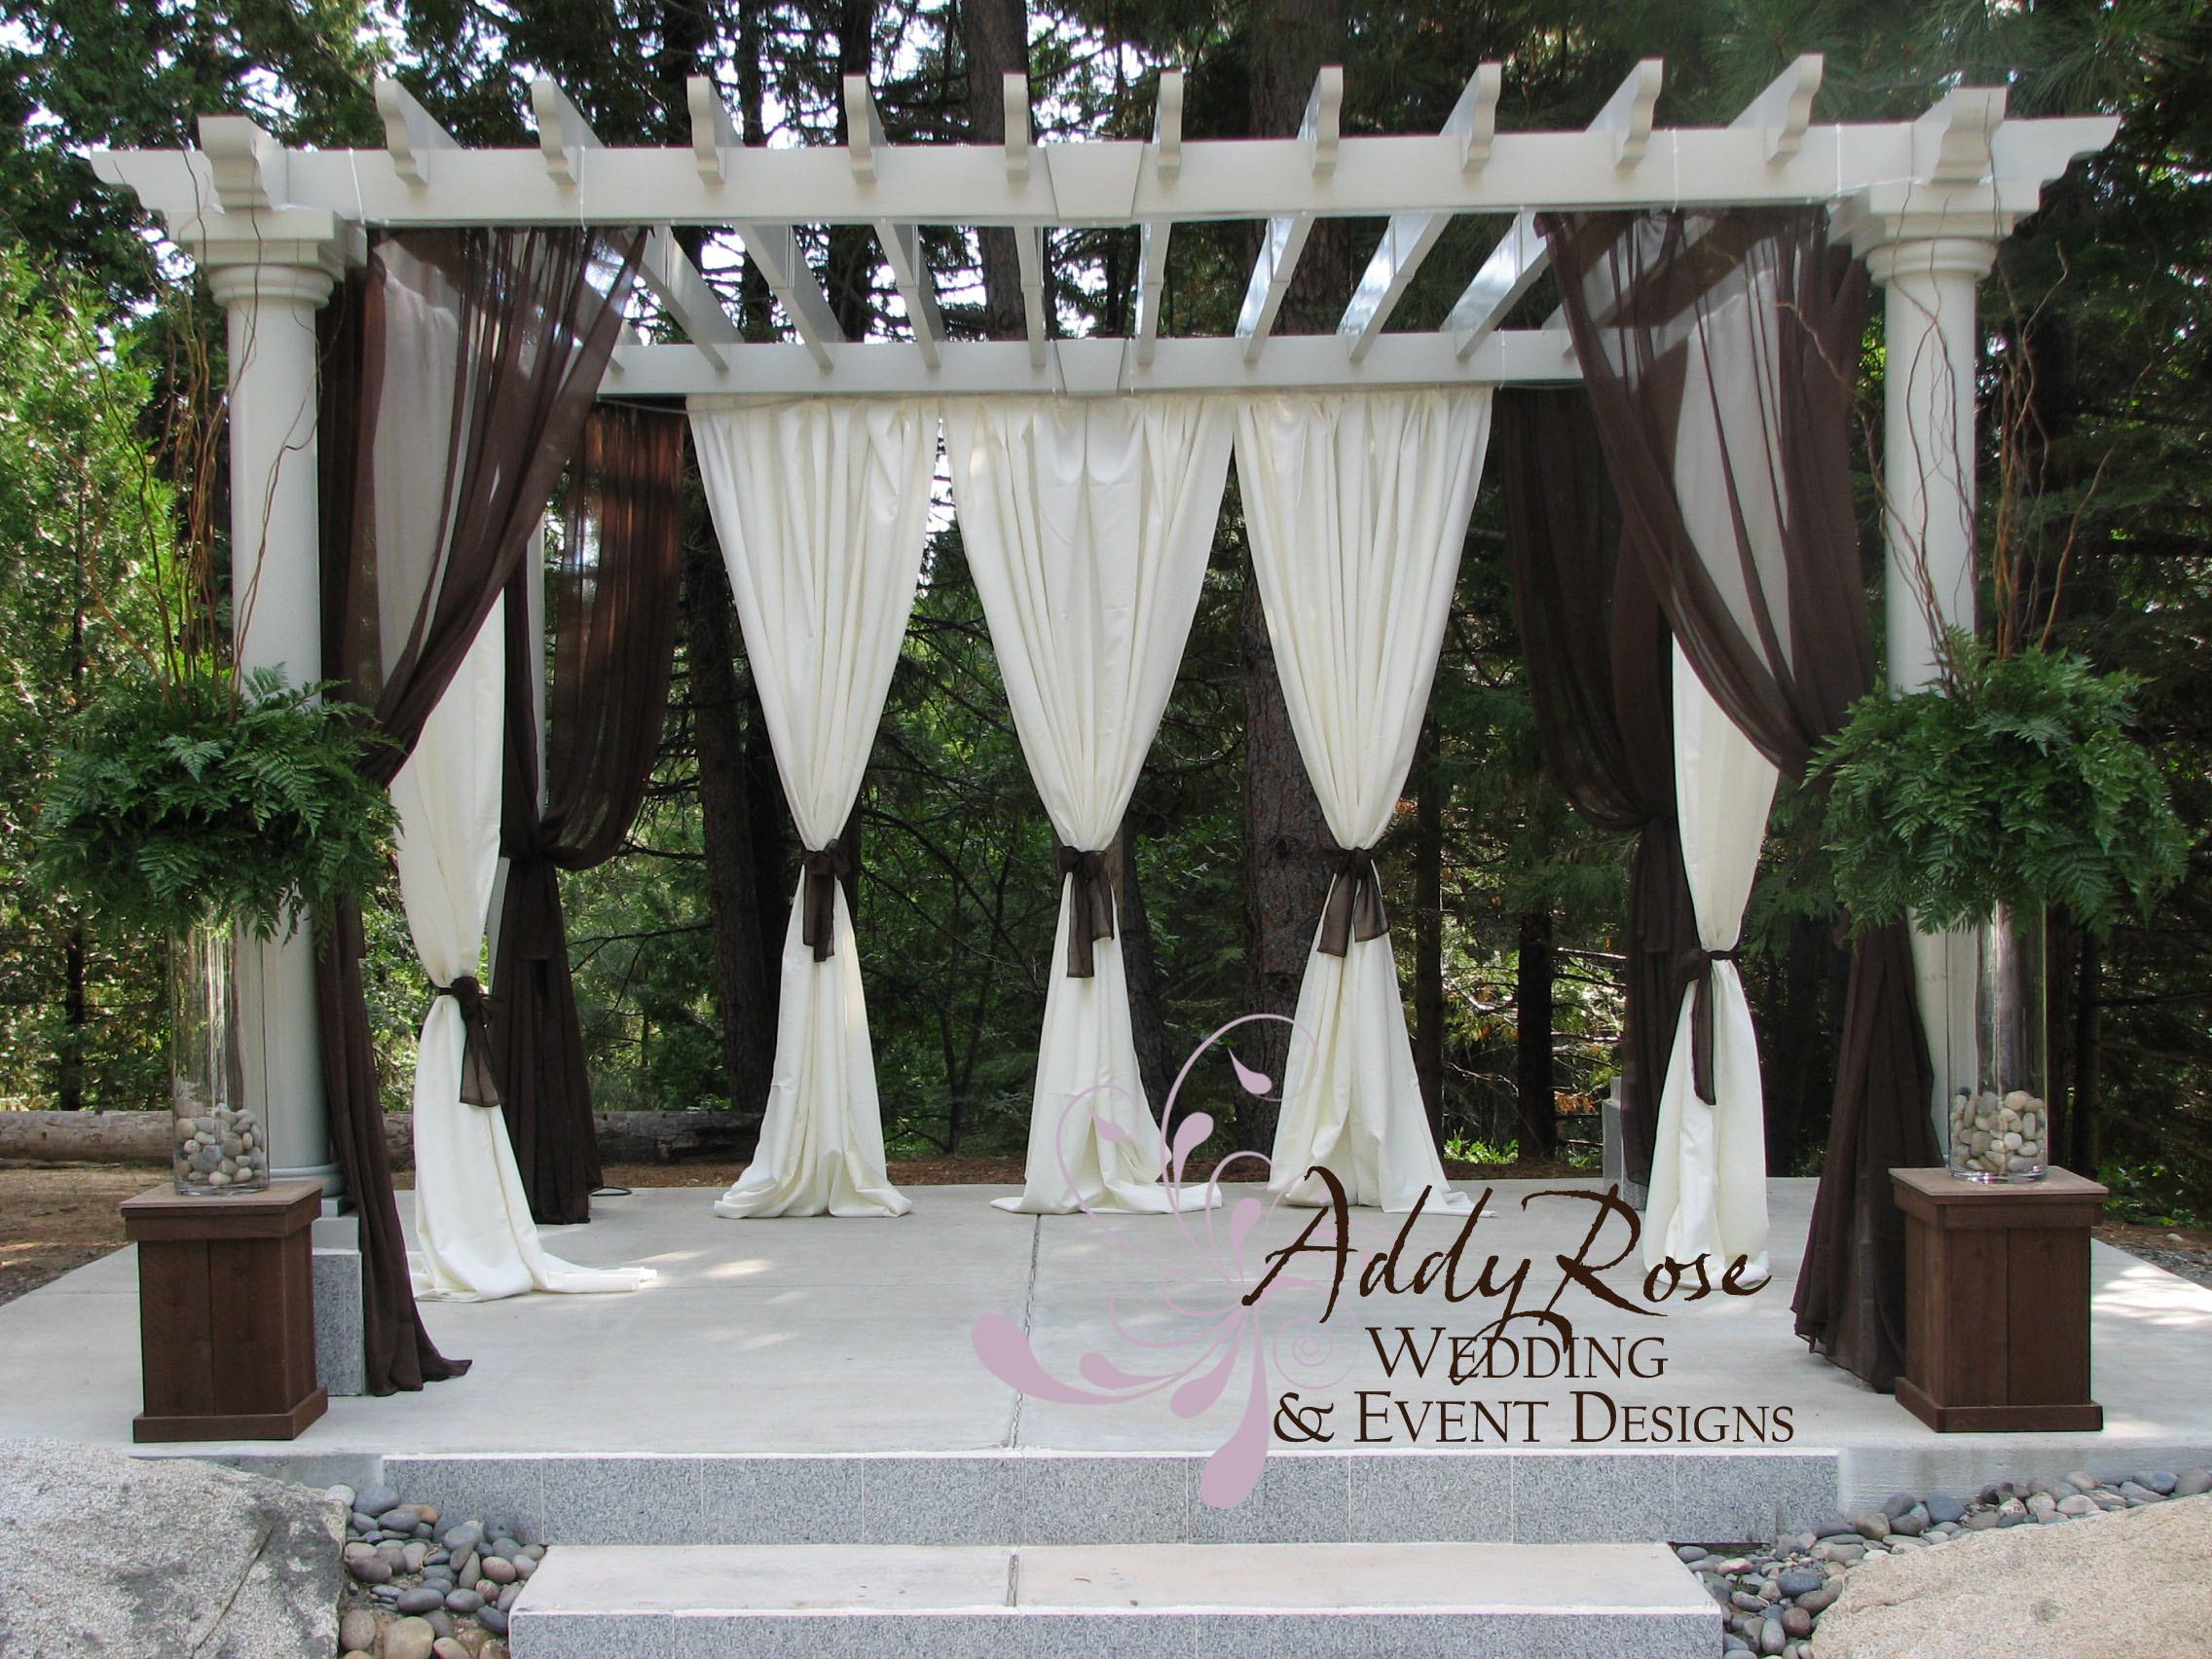 draping of gazebo at paradise springsvendors addyrose wedding amp event designs project wedding. Black Bedroom Furniture Sets. Home Design Ideas